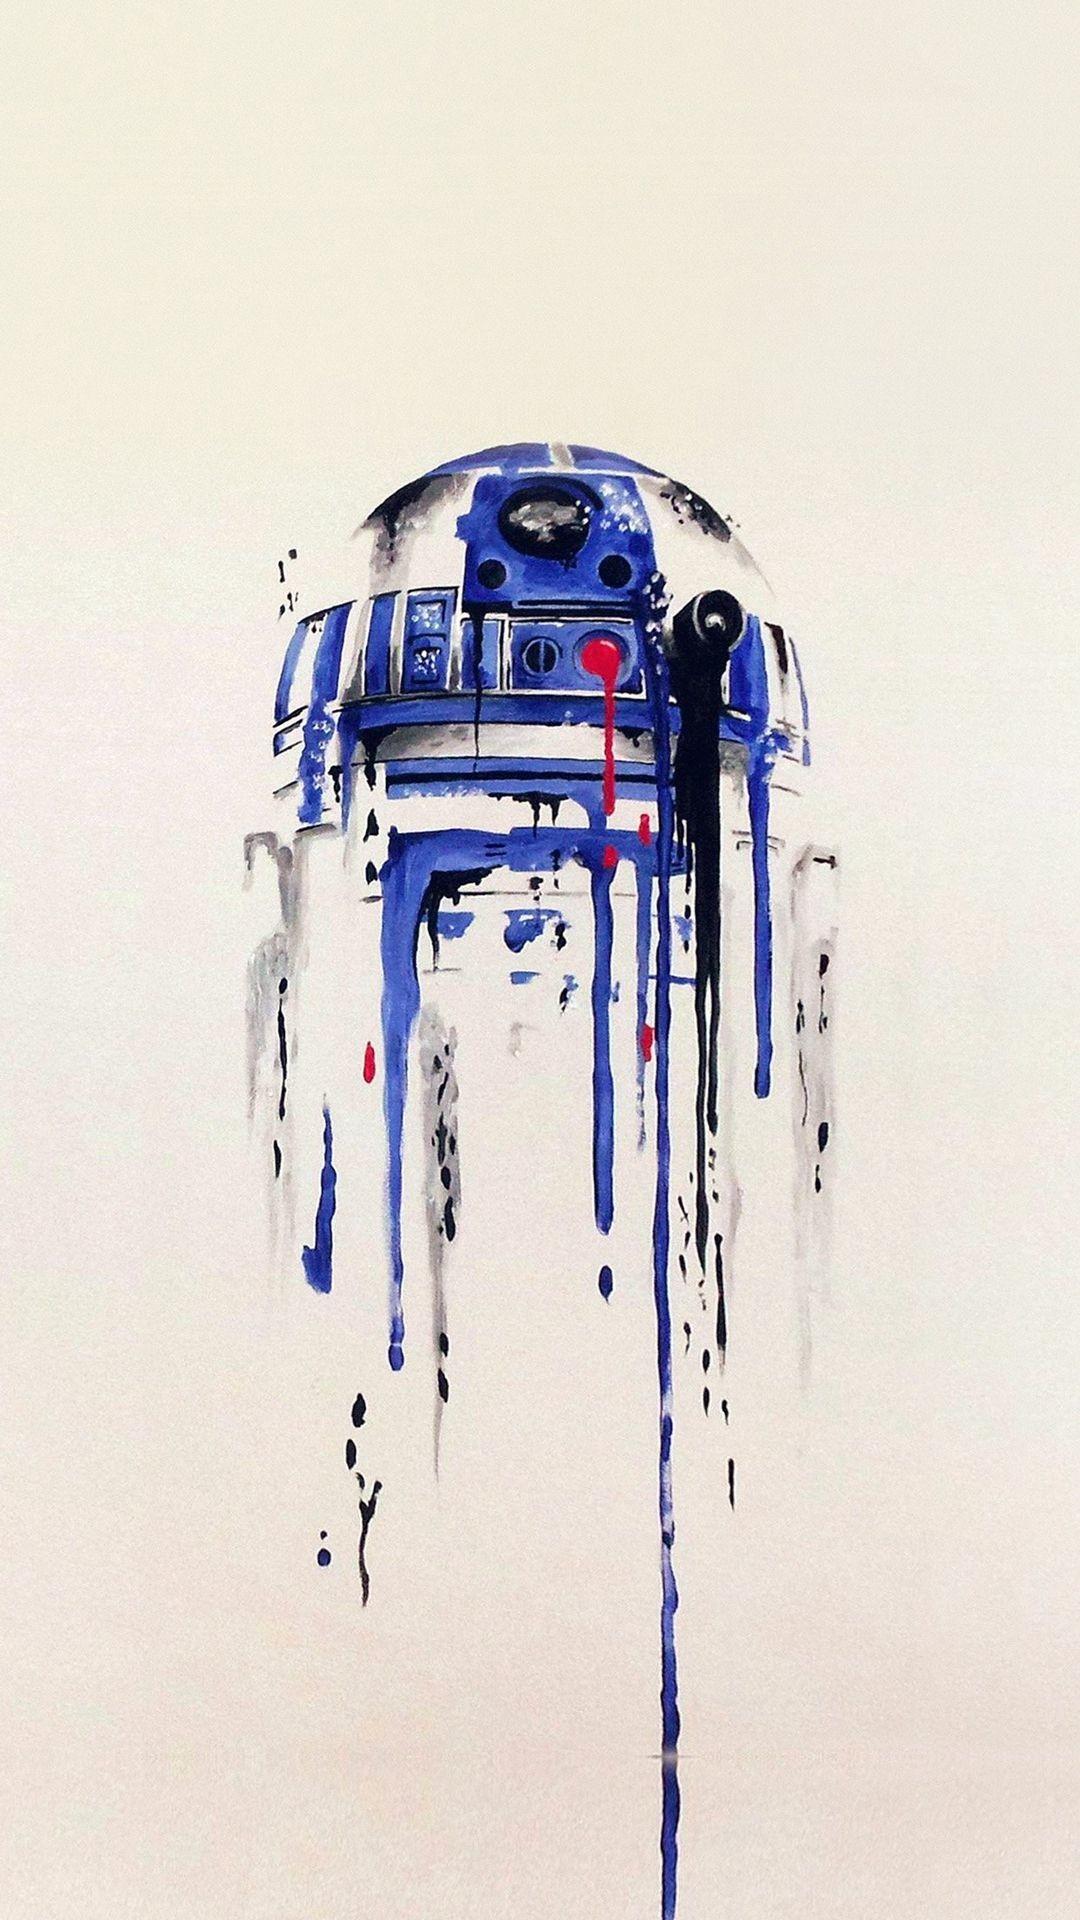 Res: 1080x1920, Minimal Painting Starwars Art Illustration. Great iPhone 6 plus wallpaper.